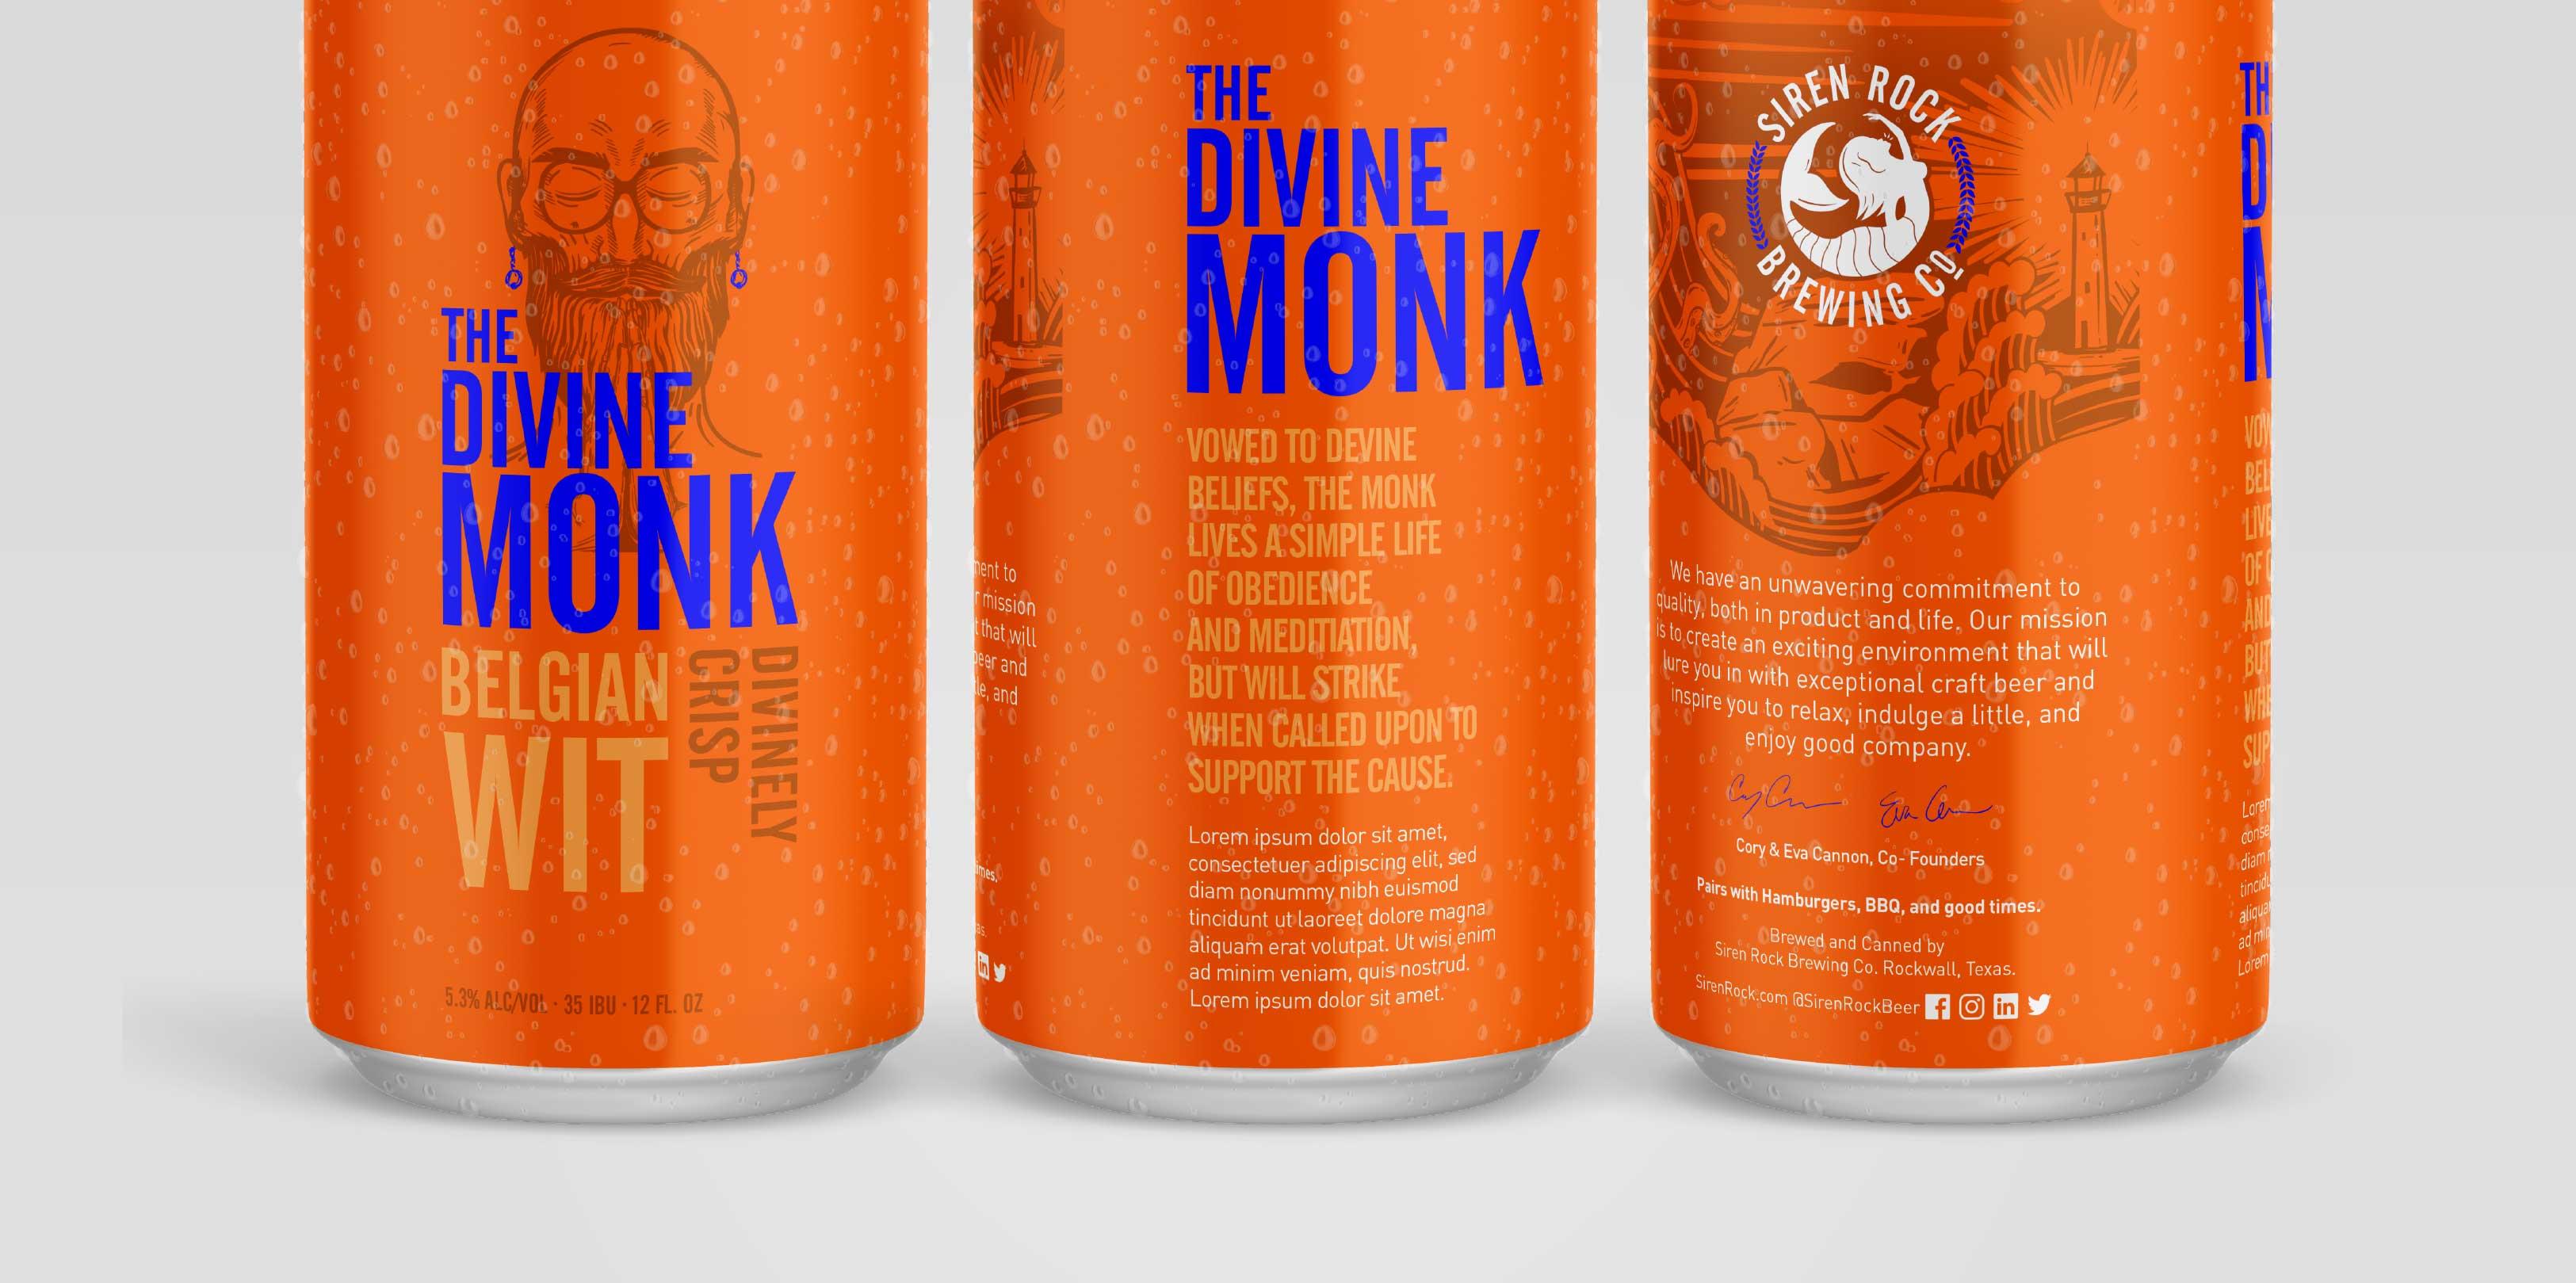 Siren Rock Package Design The Divine Monk